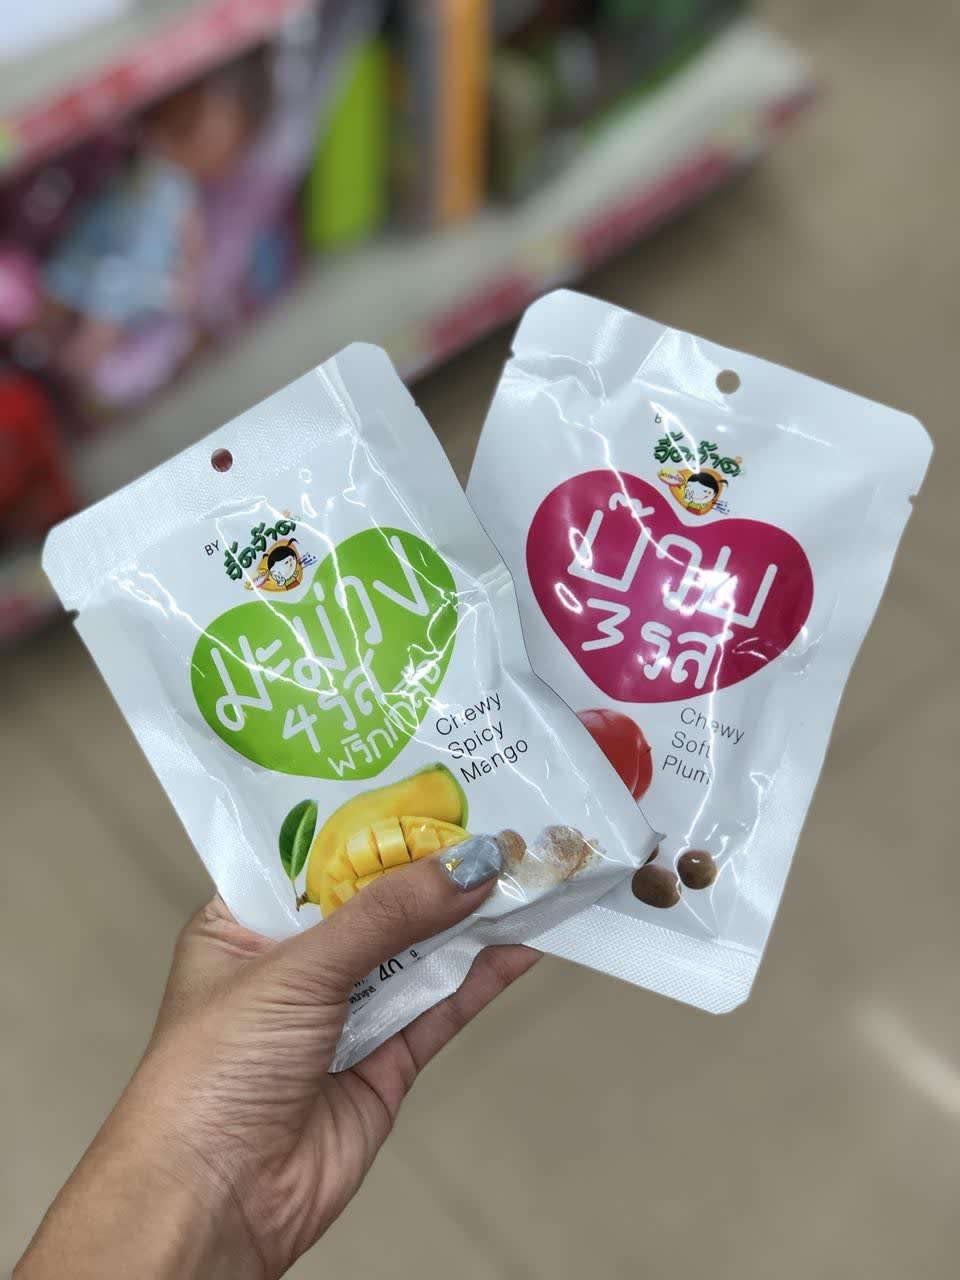 bangkok 7-11 preserved fruit snack